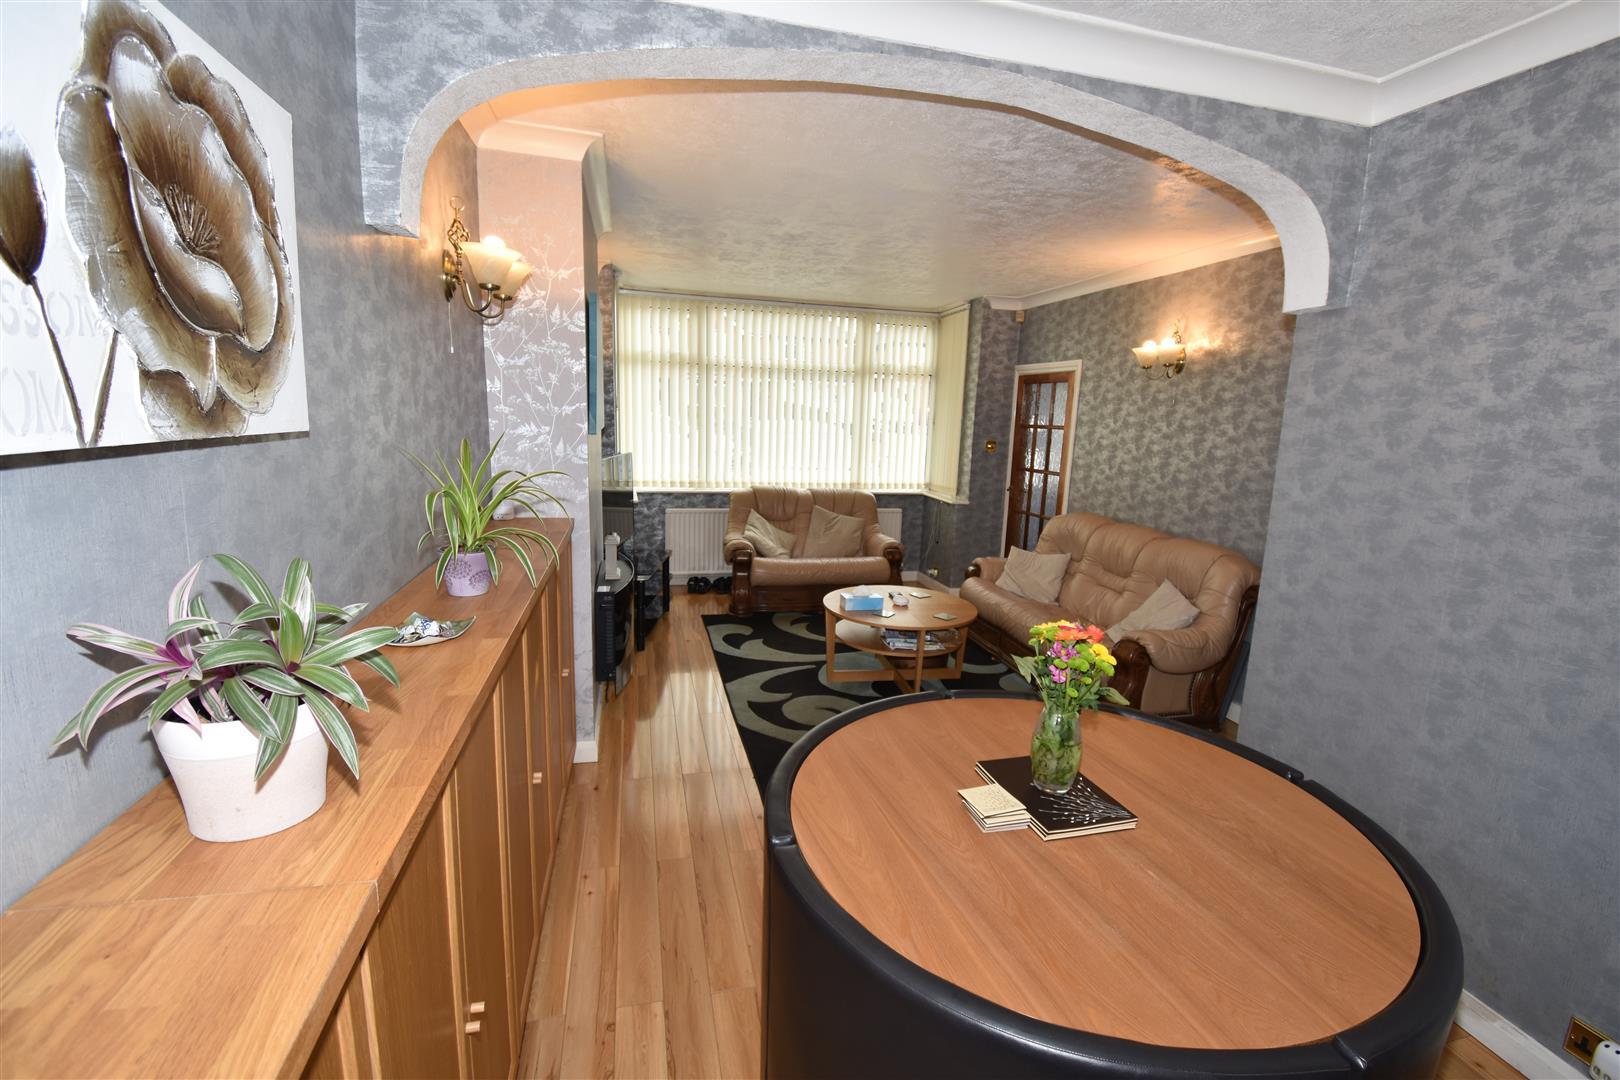 3 bed house for sale in Drews Lane, Birmingham B8 2SL 4